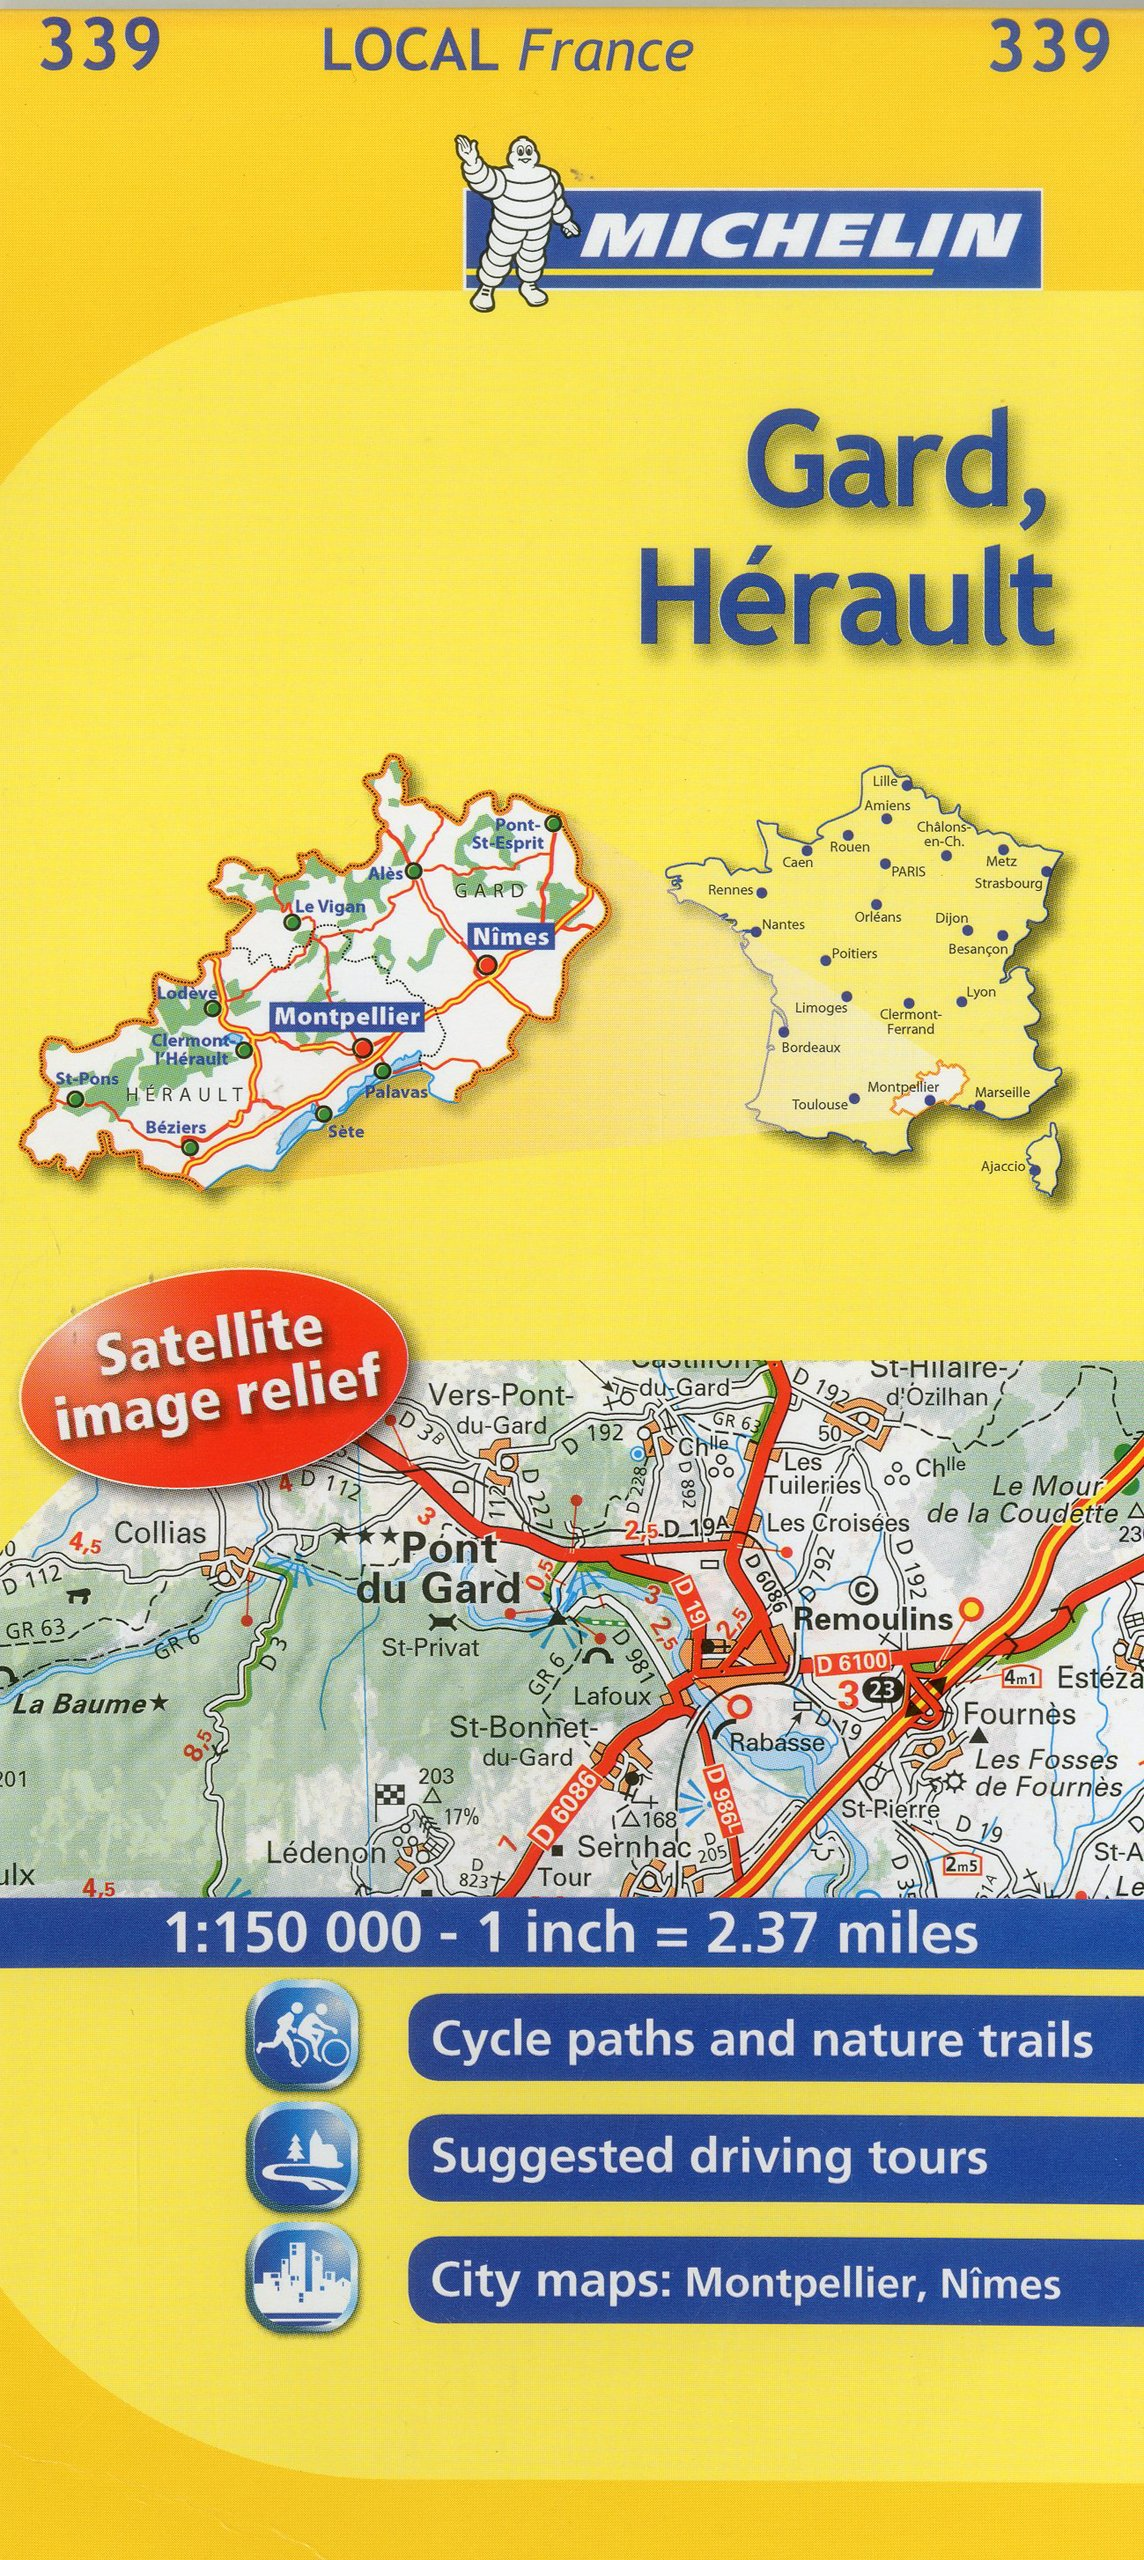 Mapa Local Gard, Hérault (Mapas Local Michelin): Amazon.es: Michelin Travel Publications: Libros en idiomas extranjeros